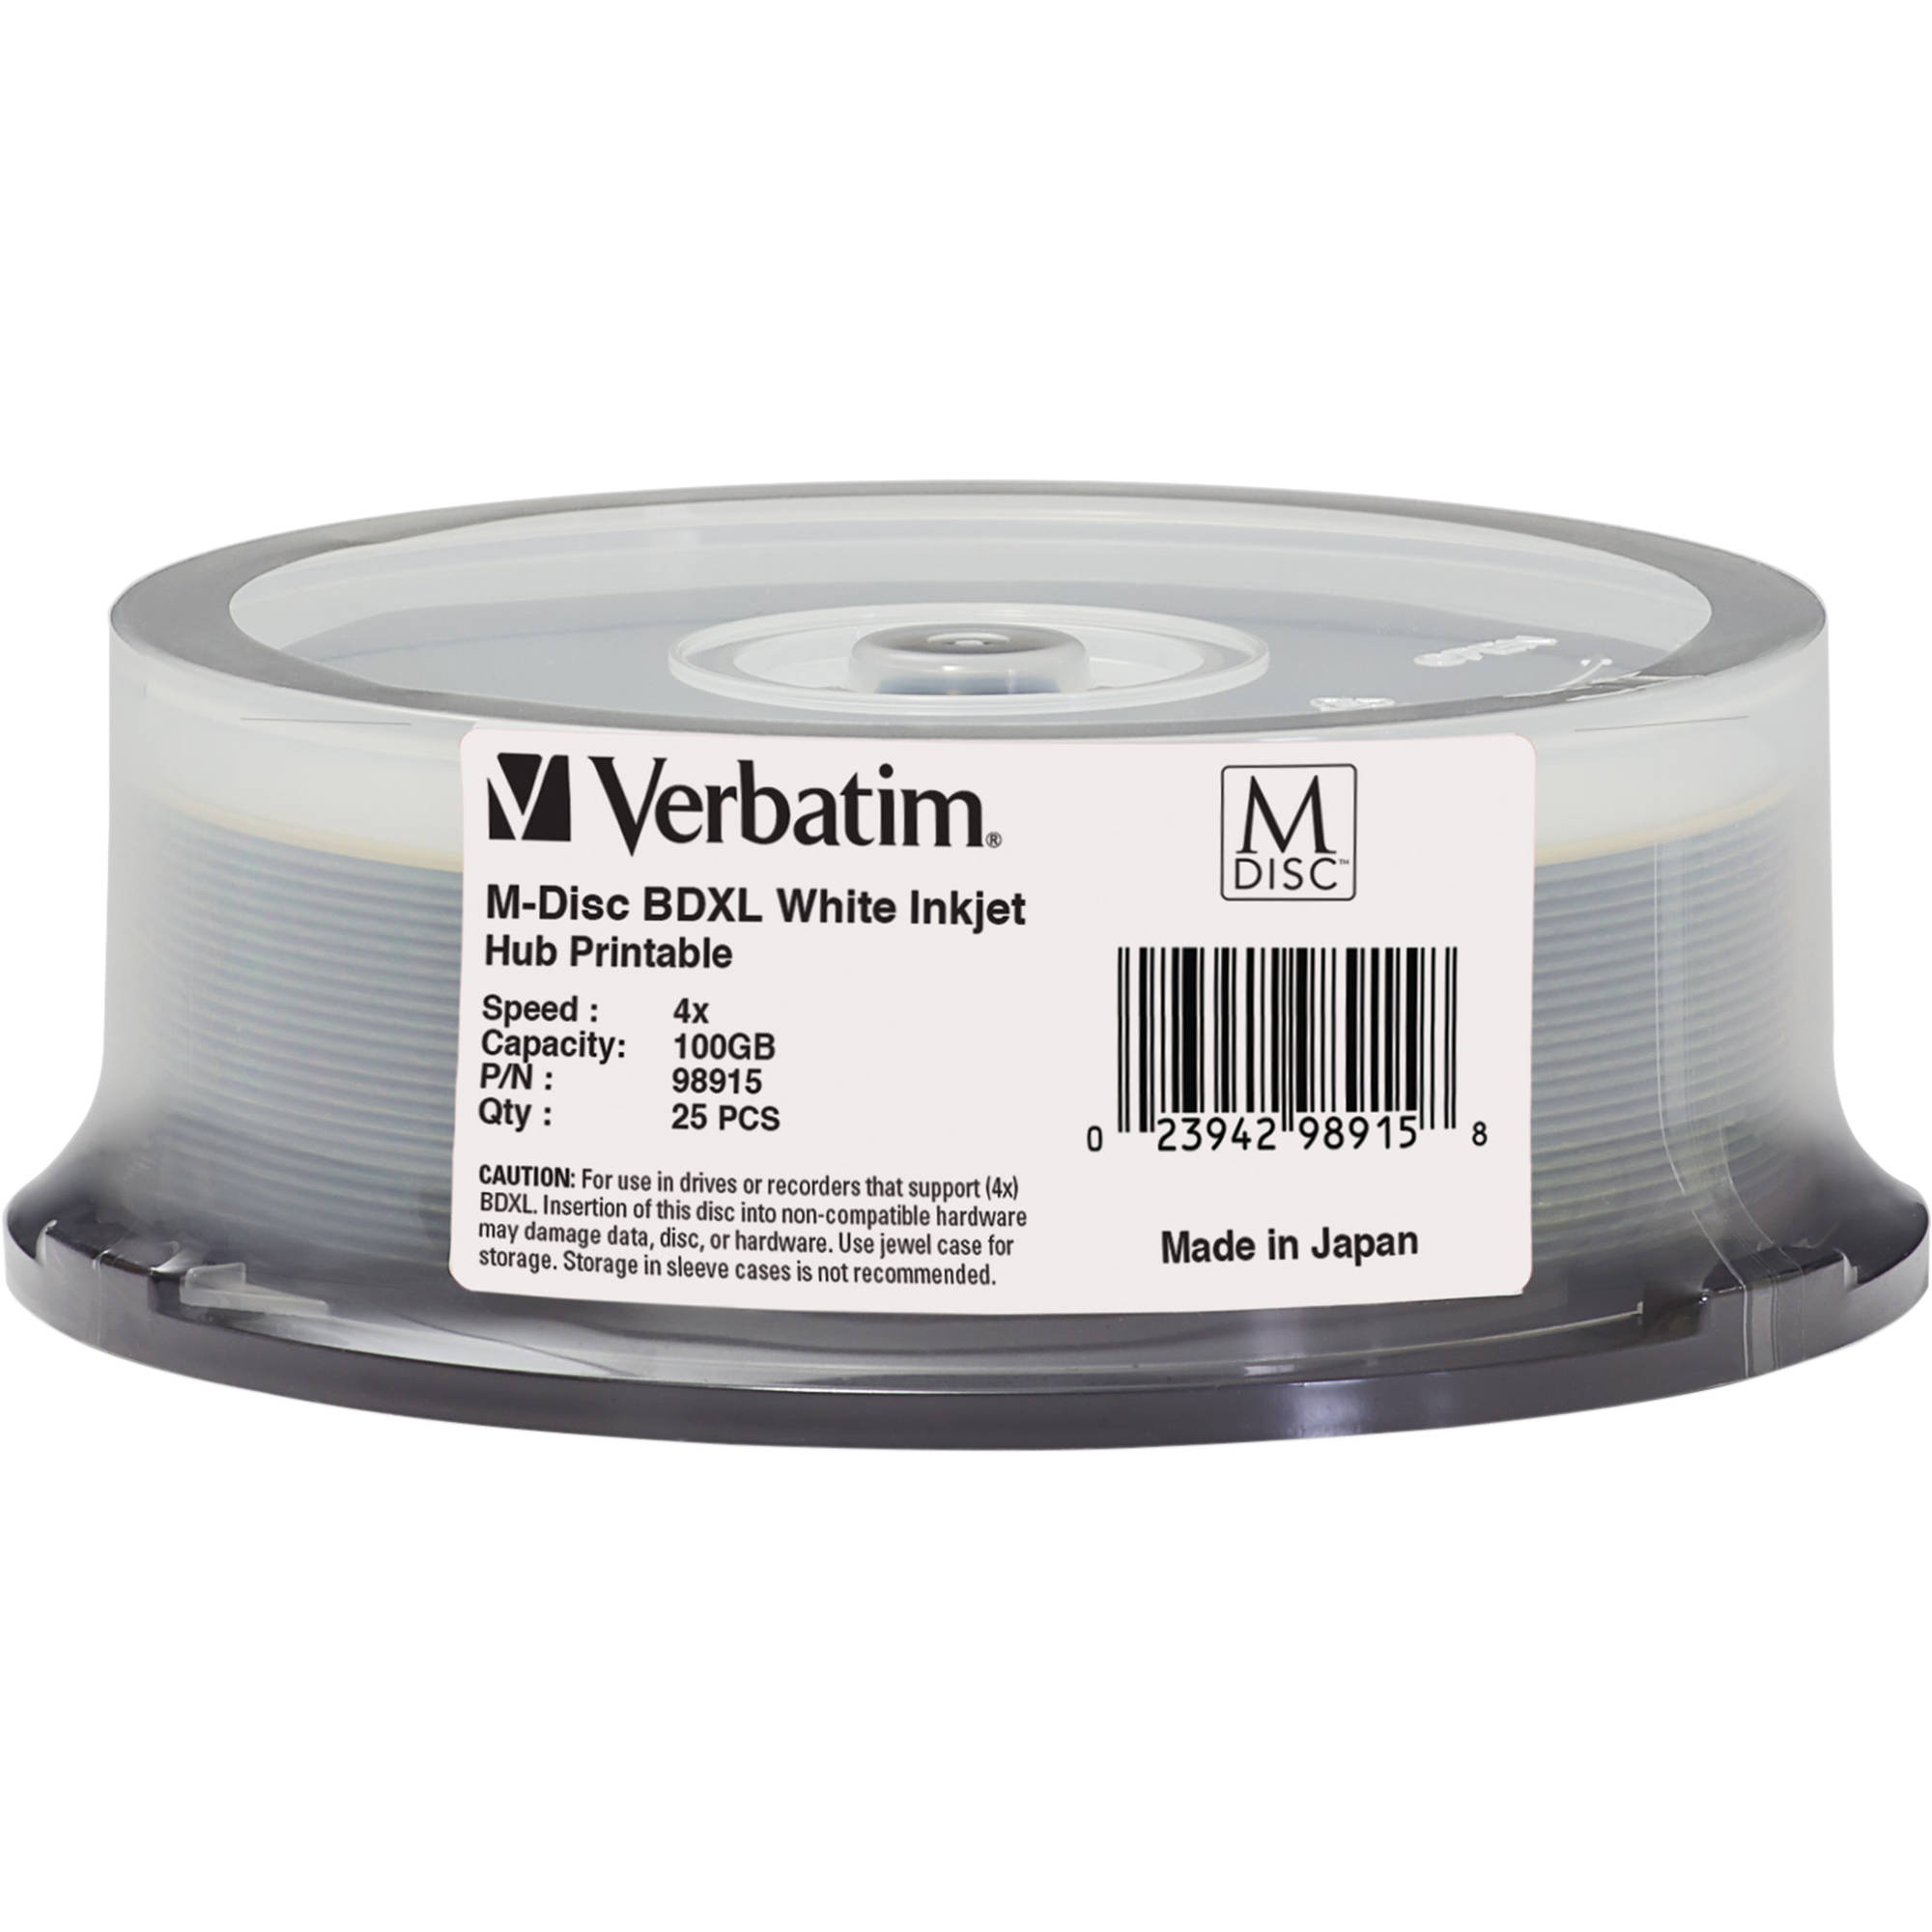 Verbatim M-DISC BDXL 100GB 4x White Inkjet/Hub Printable Disc (25-Pack  Spindle)